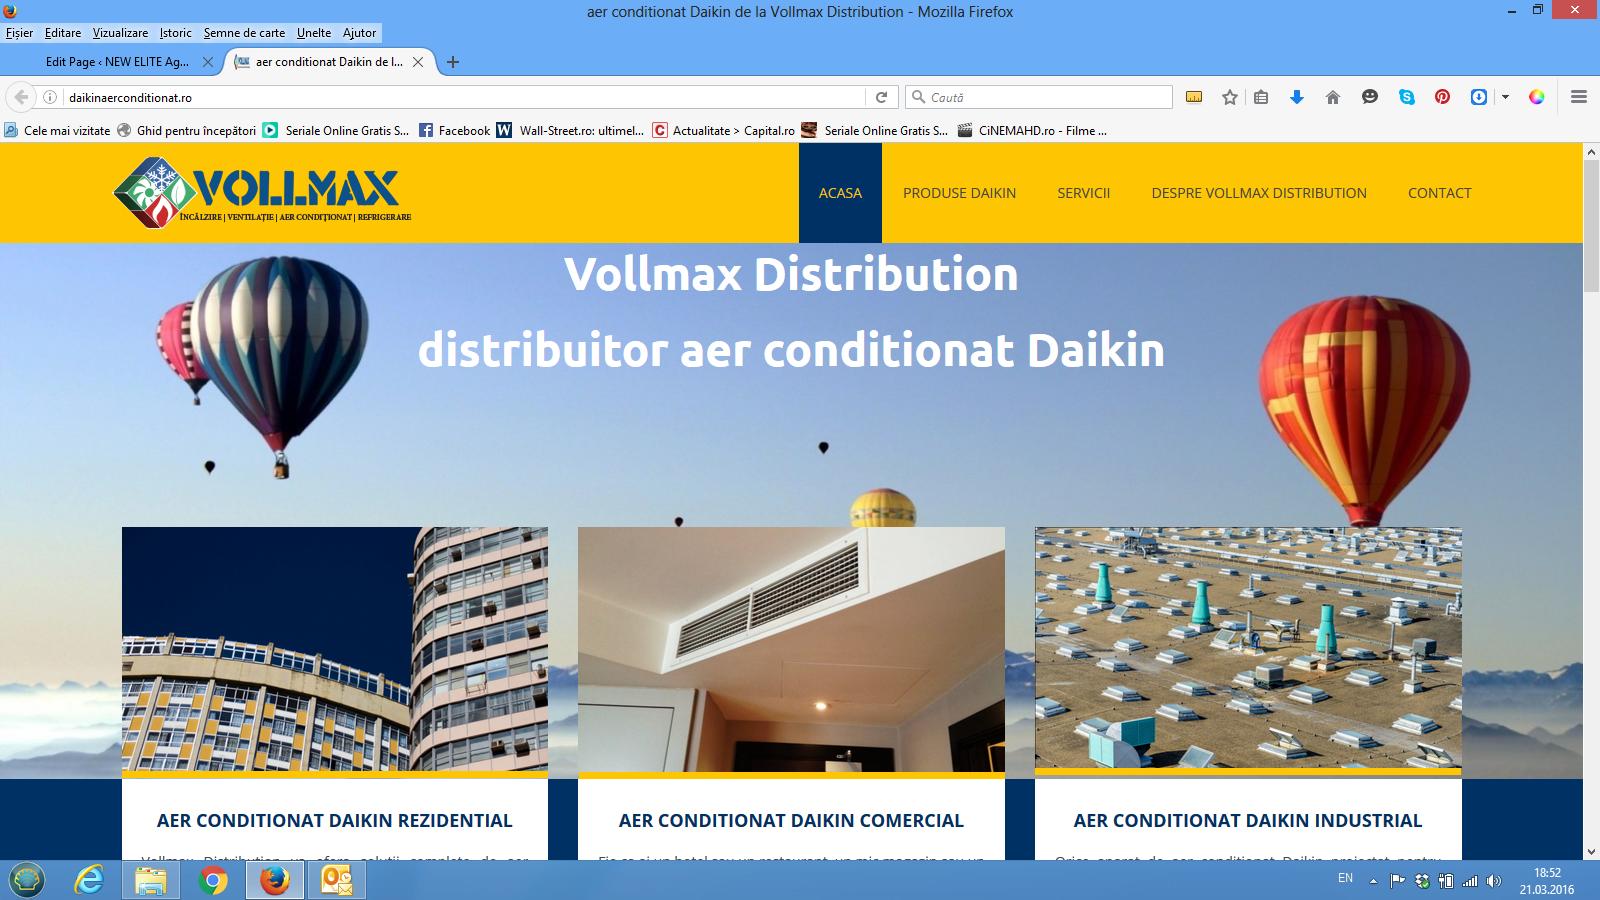 captura print screen Vollmax Distribution